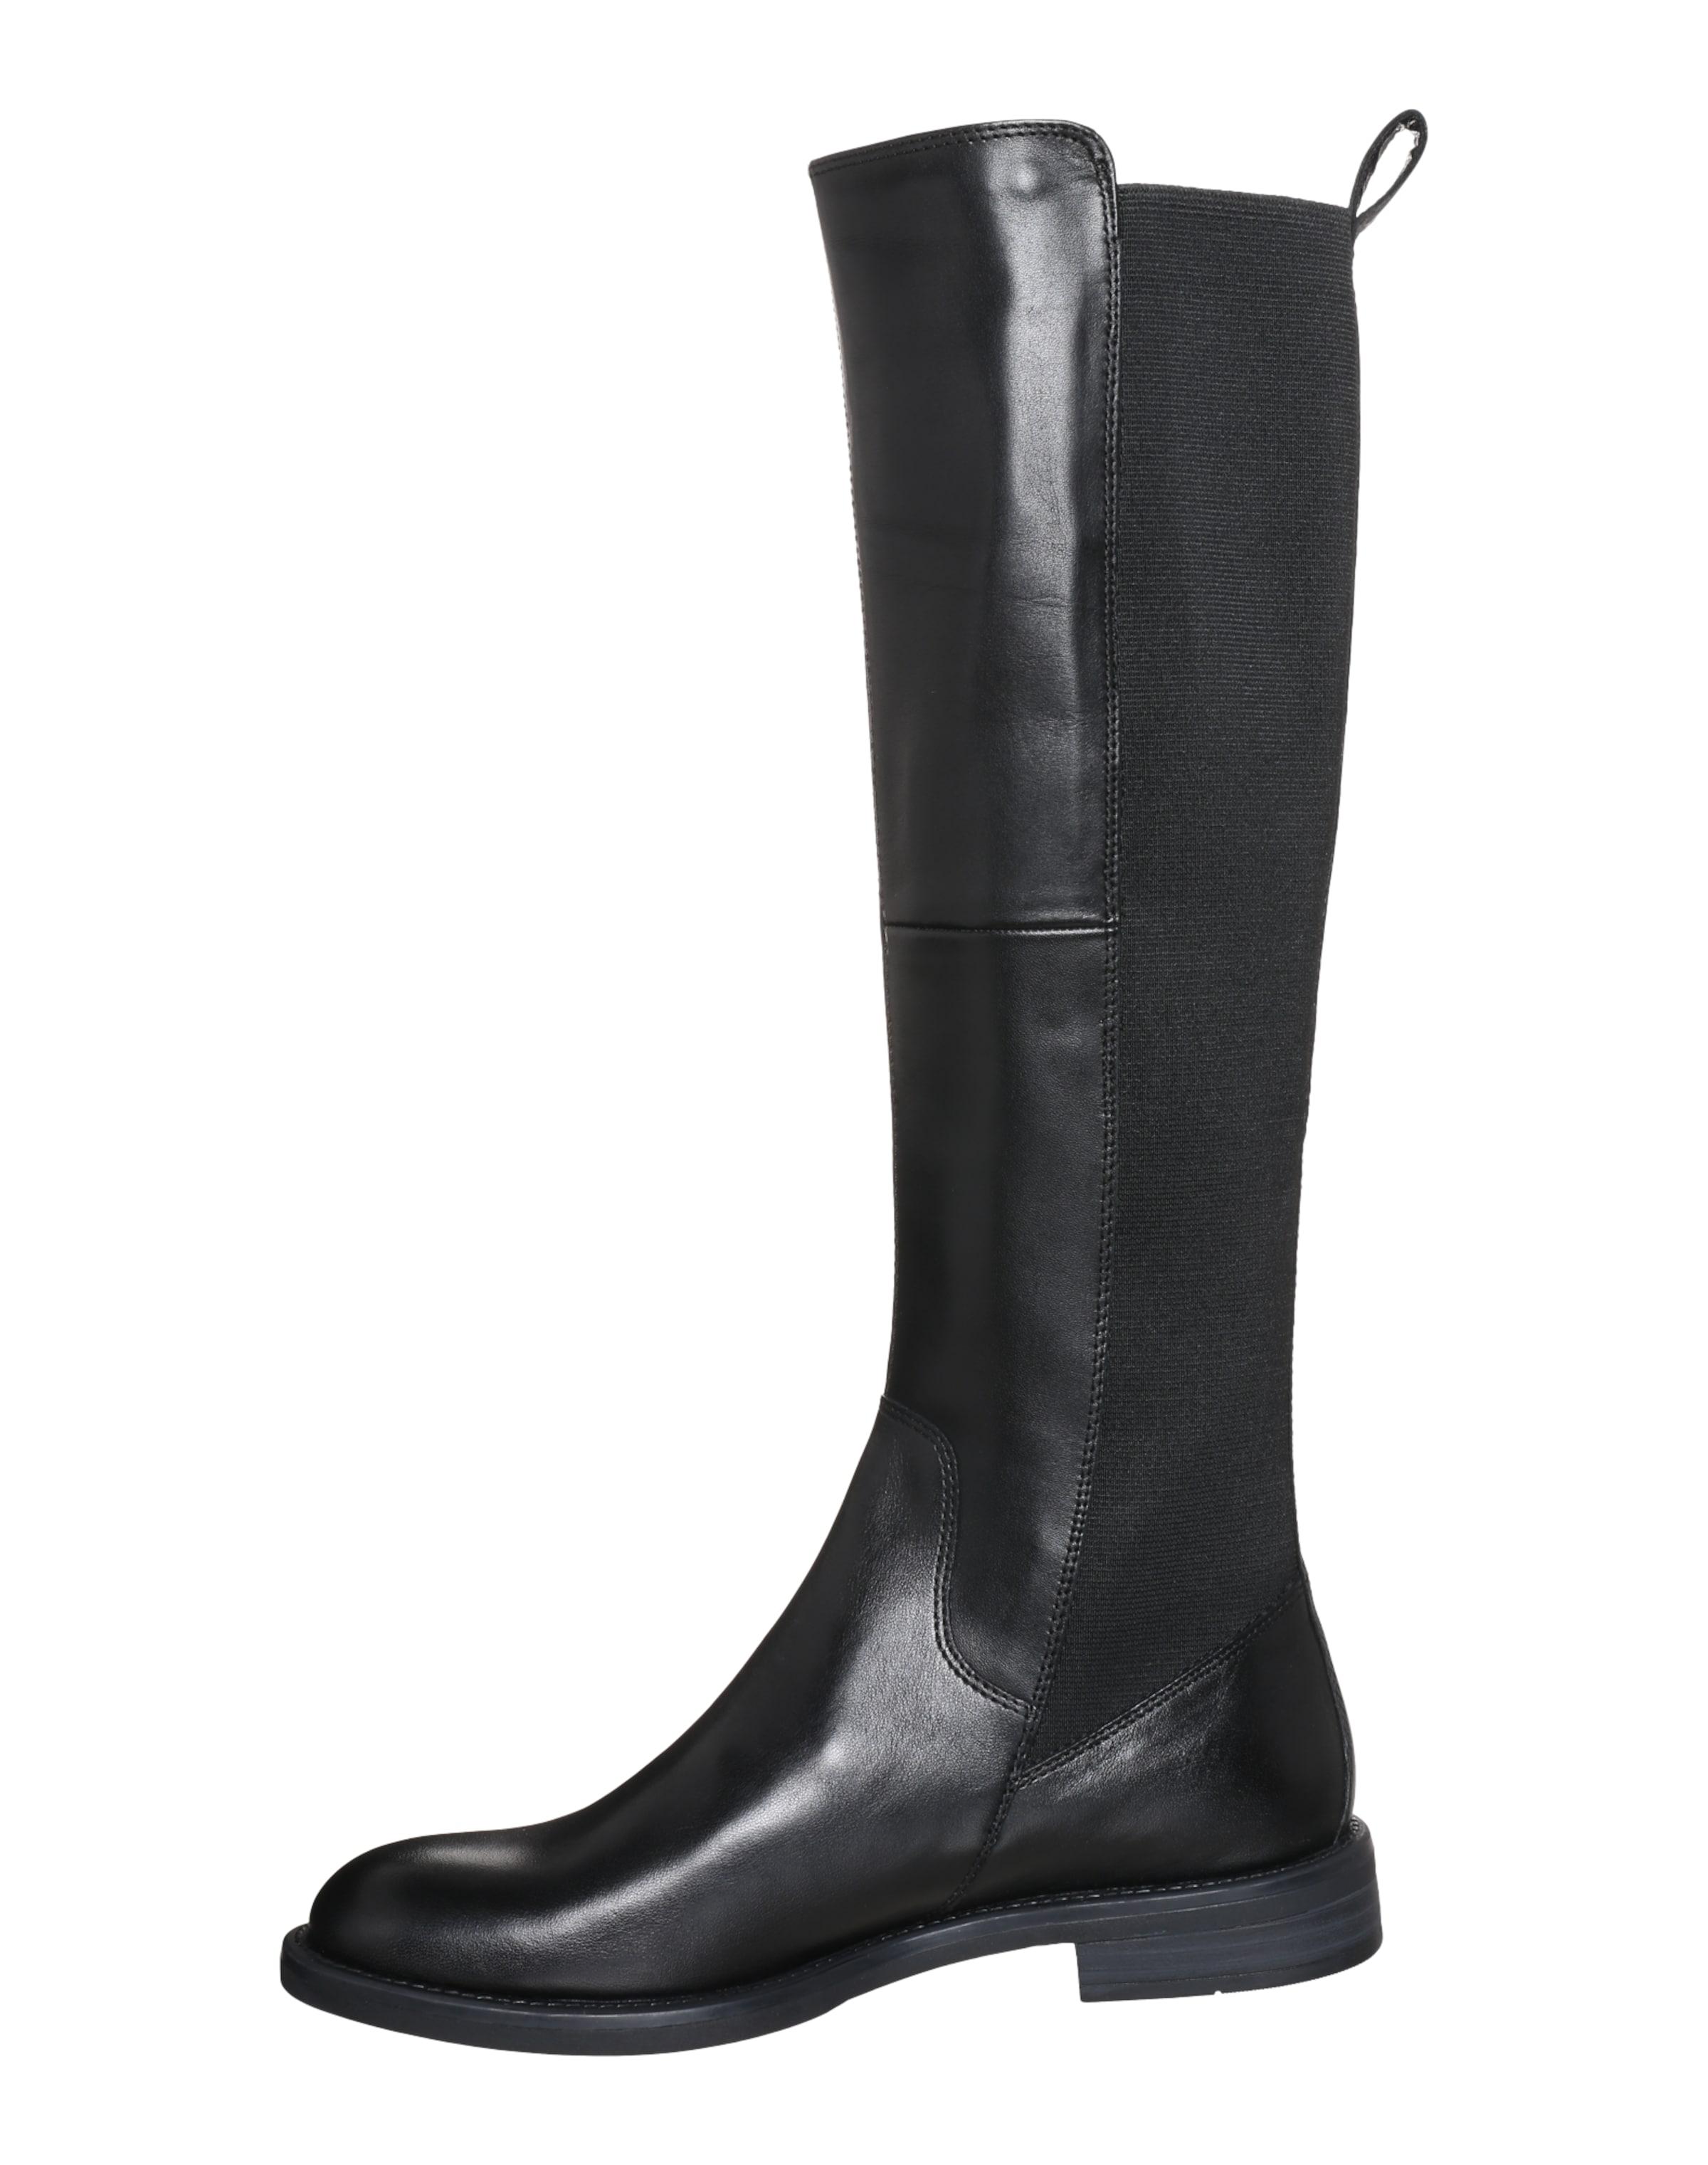 Shoemakers In Vagabond Schwarz Langschaftstiefel 'amina' c45SjLqA3R